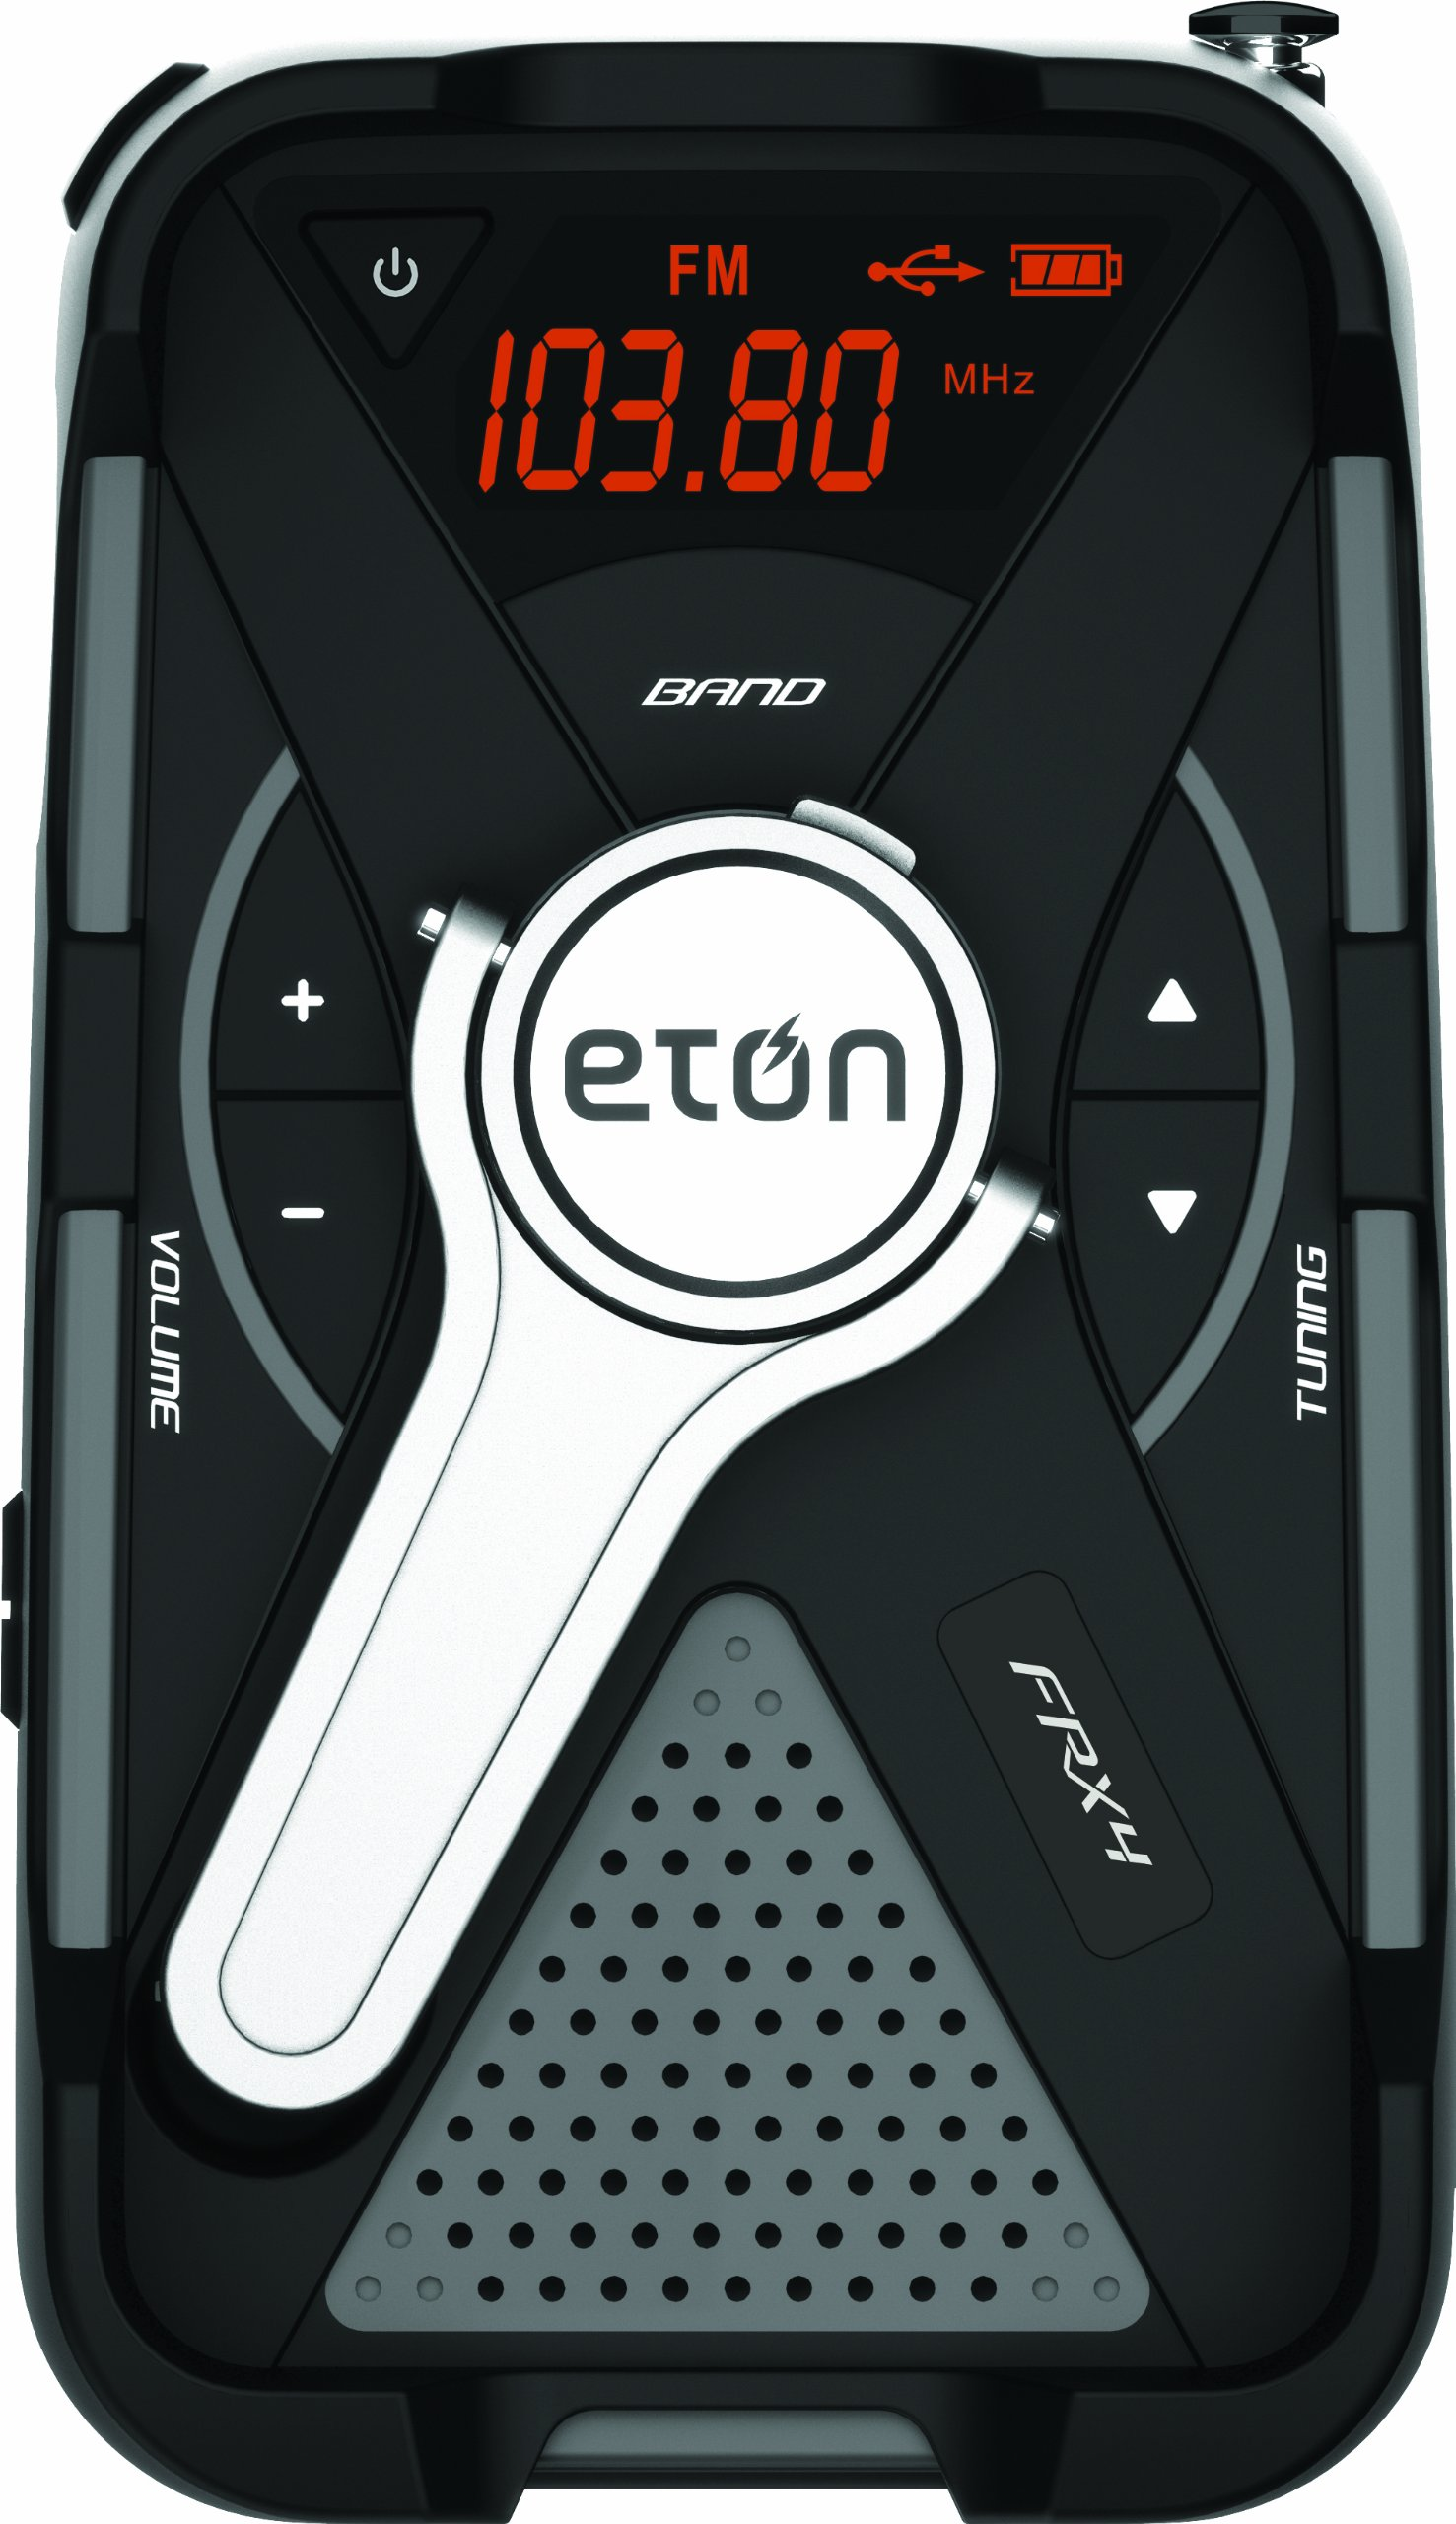 Eton All-Purpose Weather Alert Radio, FRX4 (Gray)